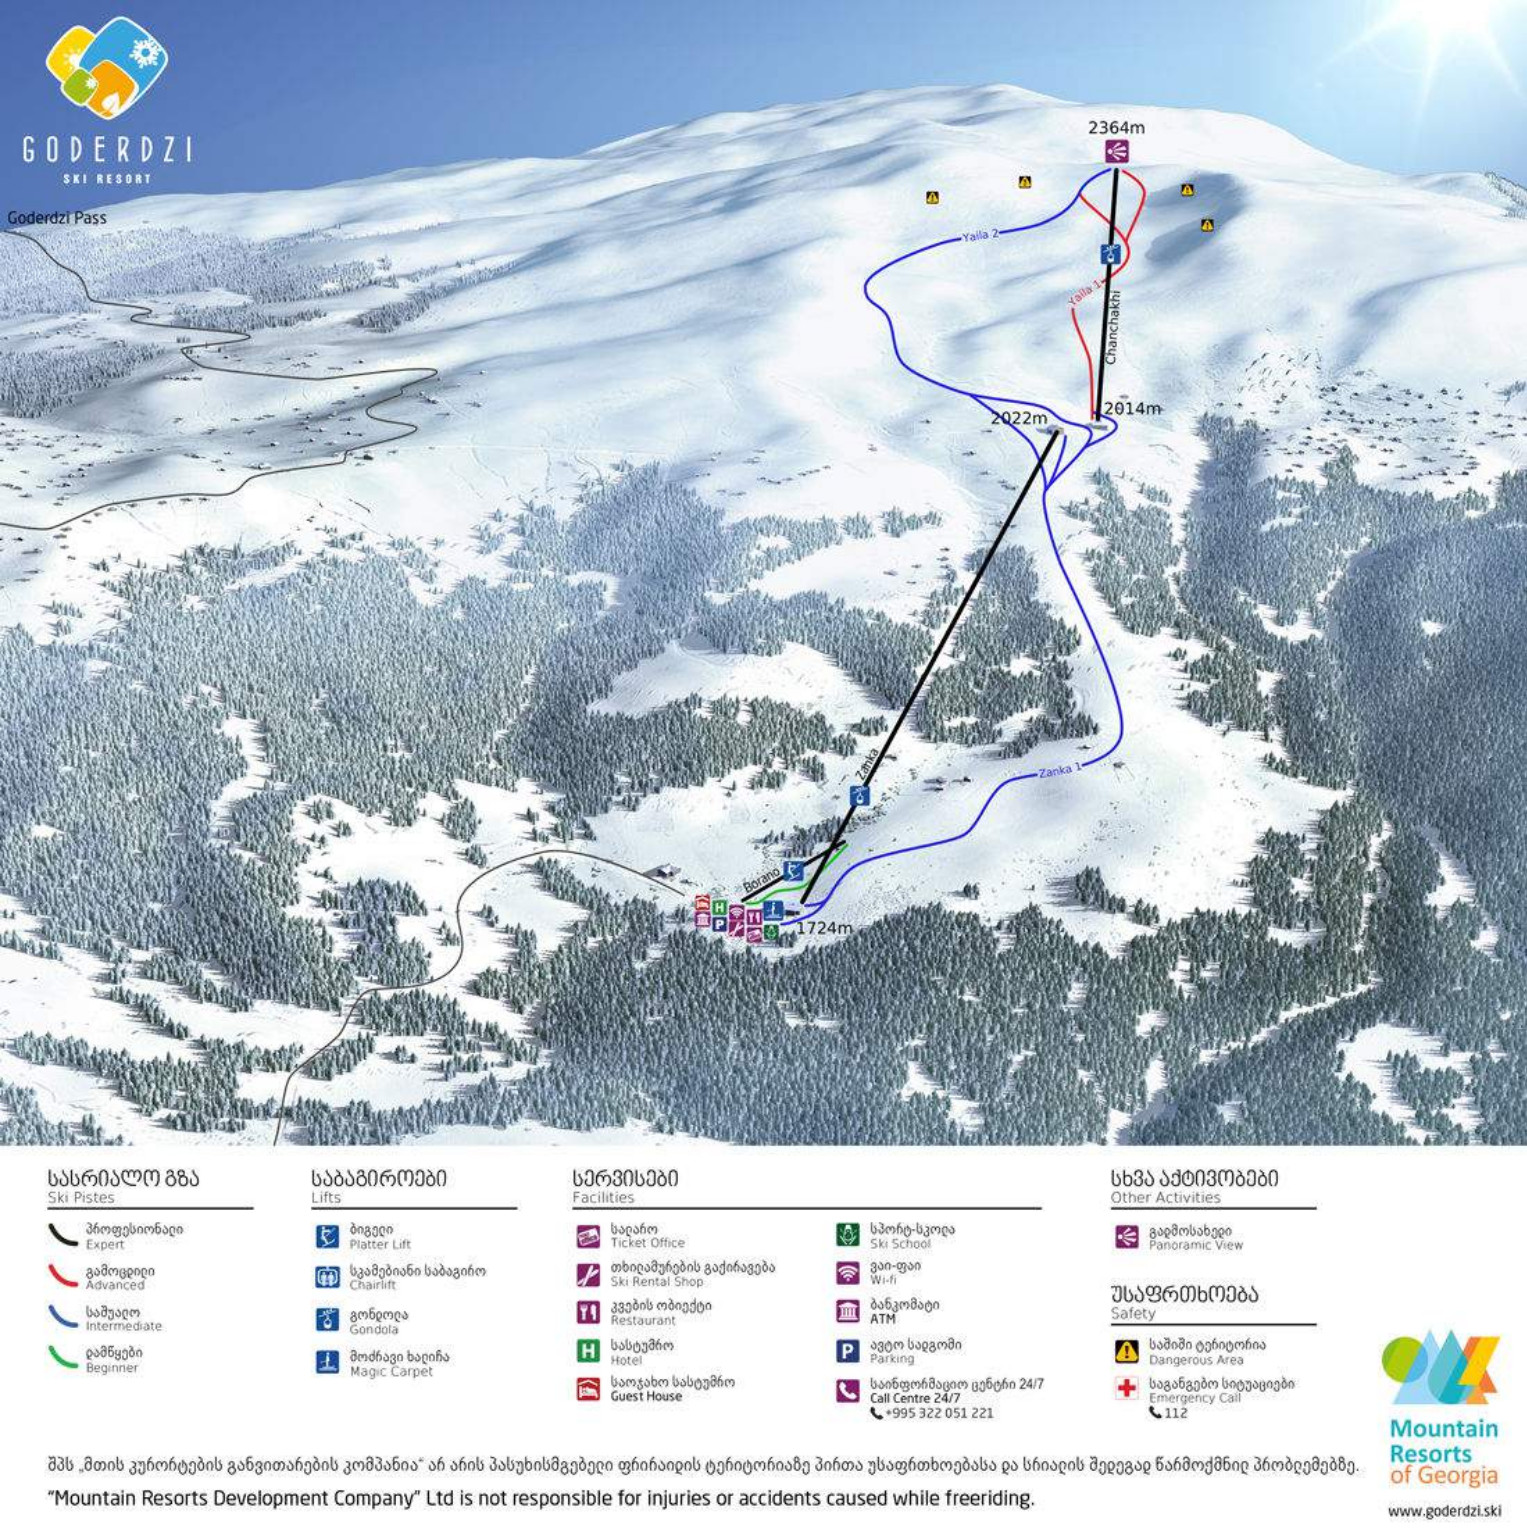 Goderdzi Piste / Trail Map